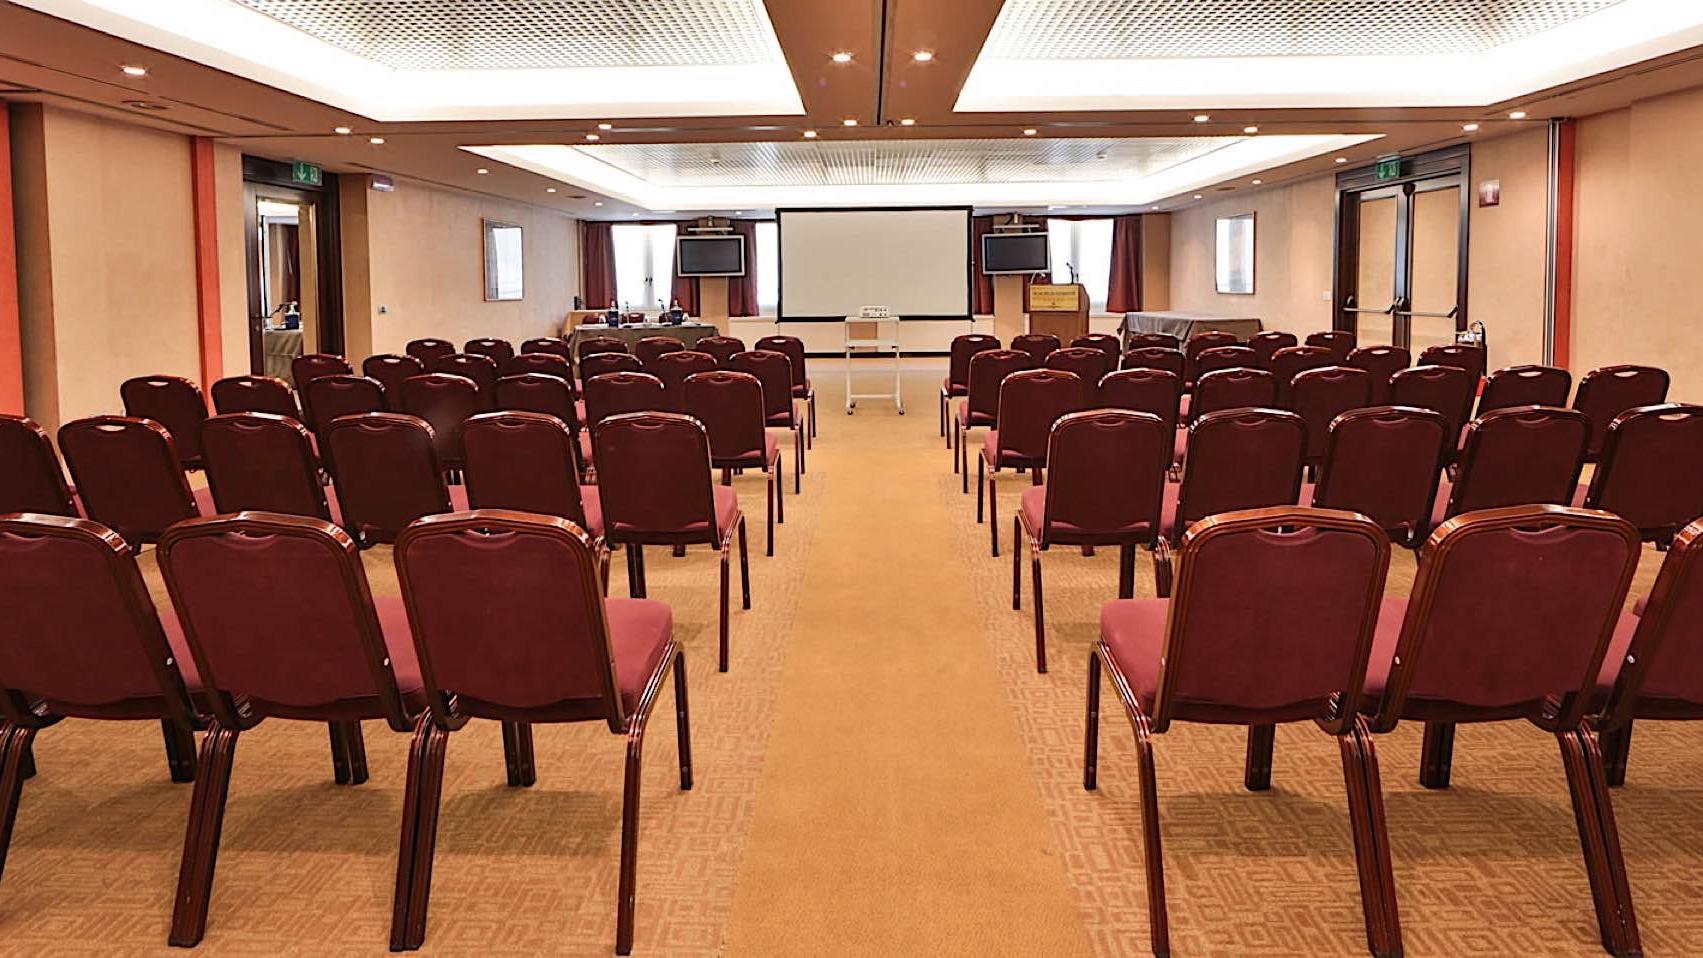 Meeting Room | Principi Di Piemonte